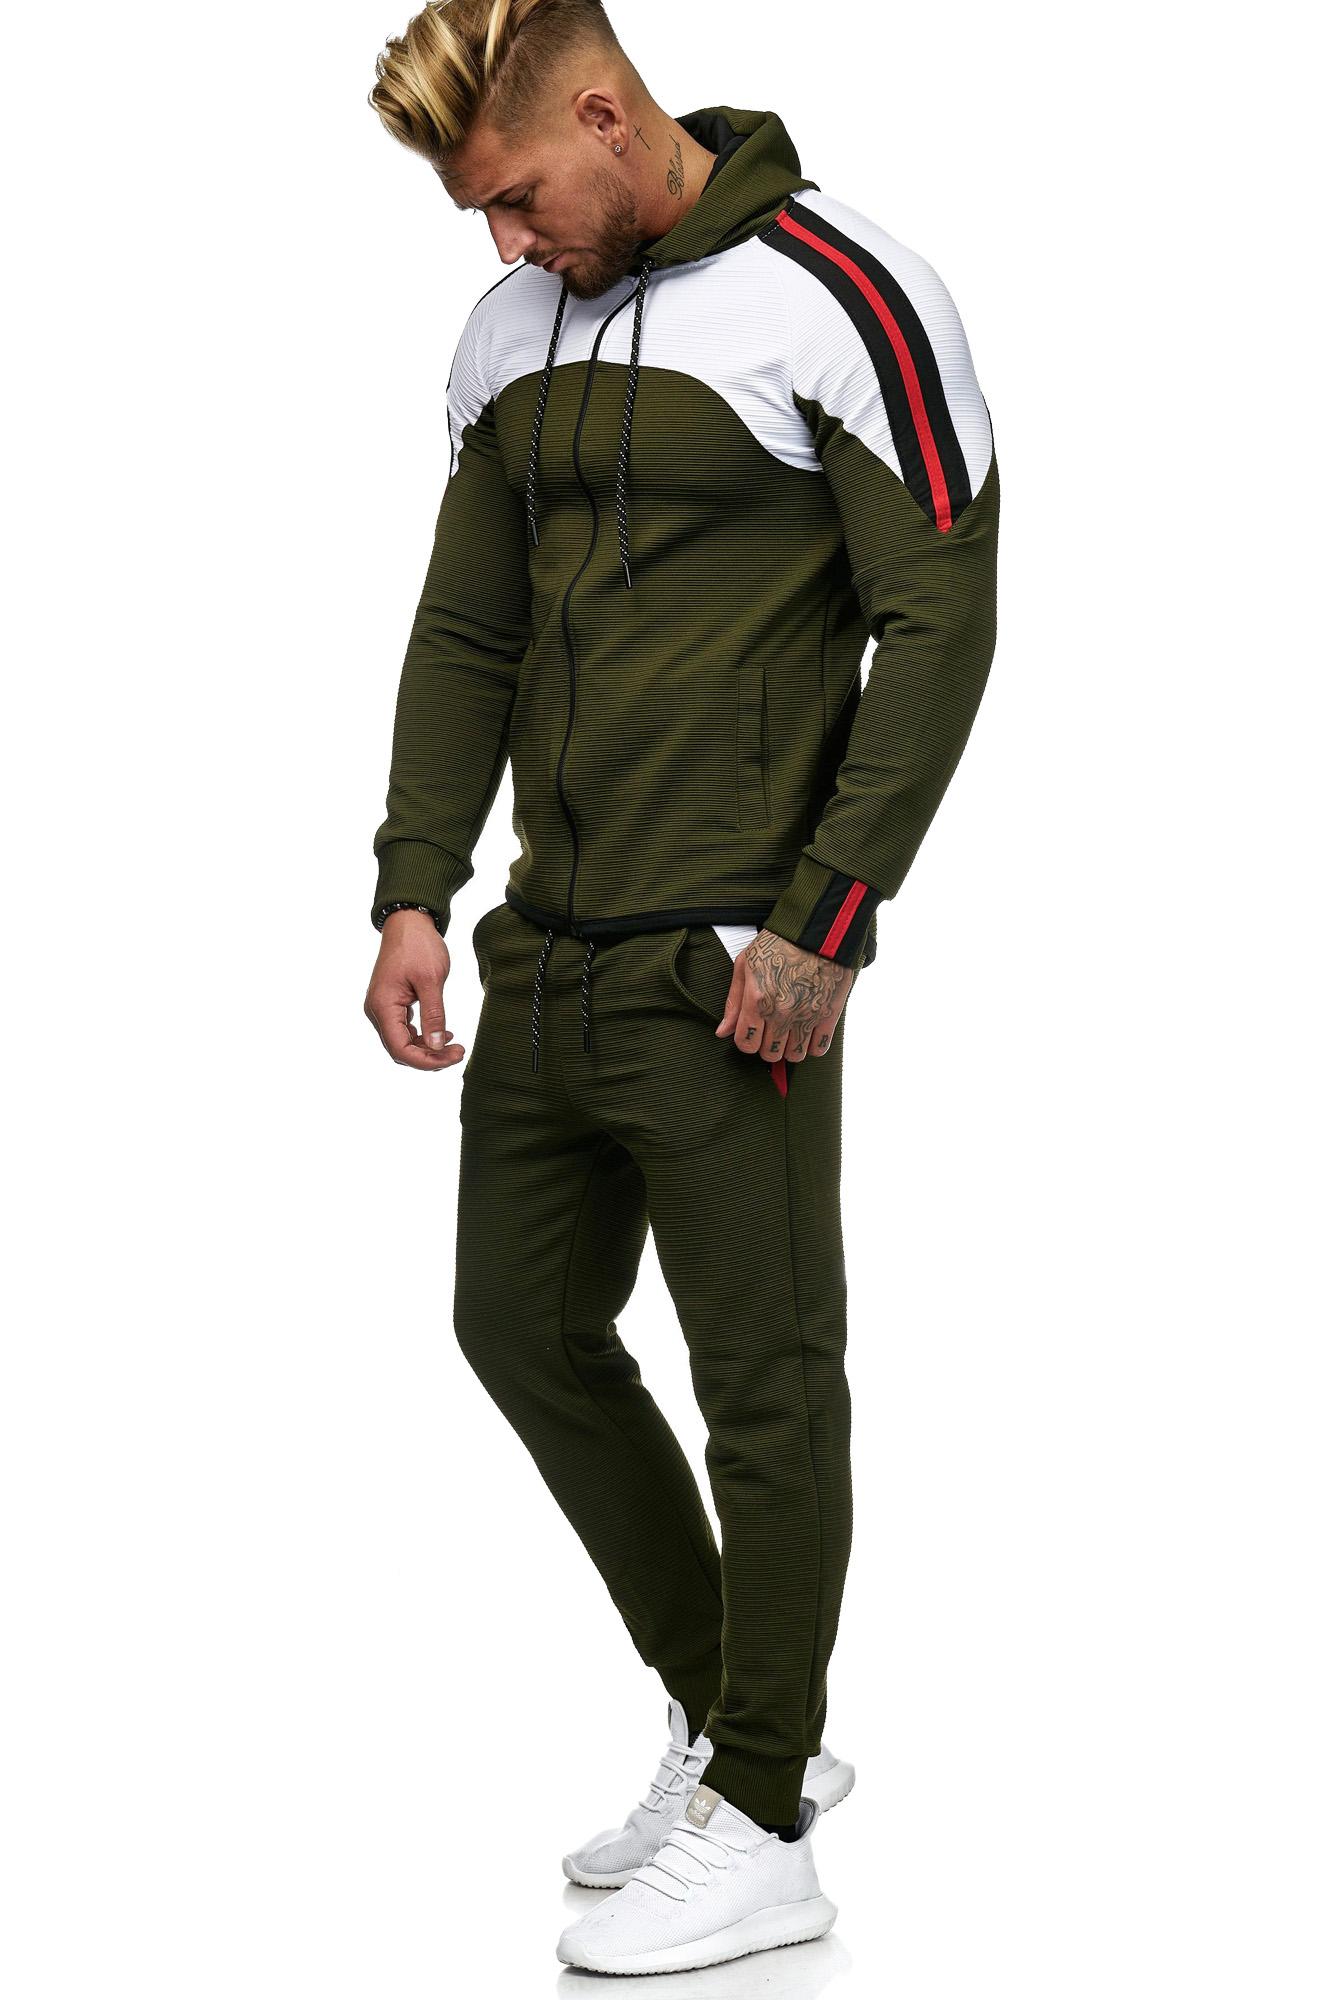 Sweat Suit Man Khaki 52006 1